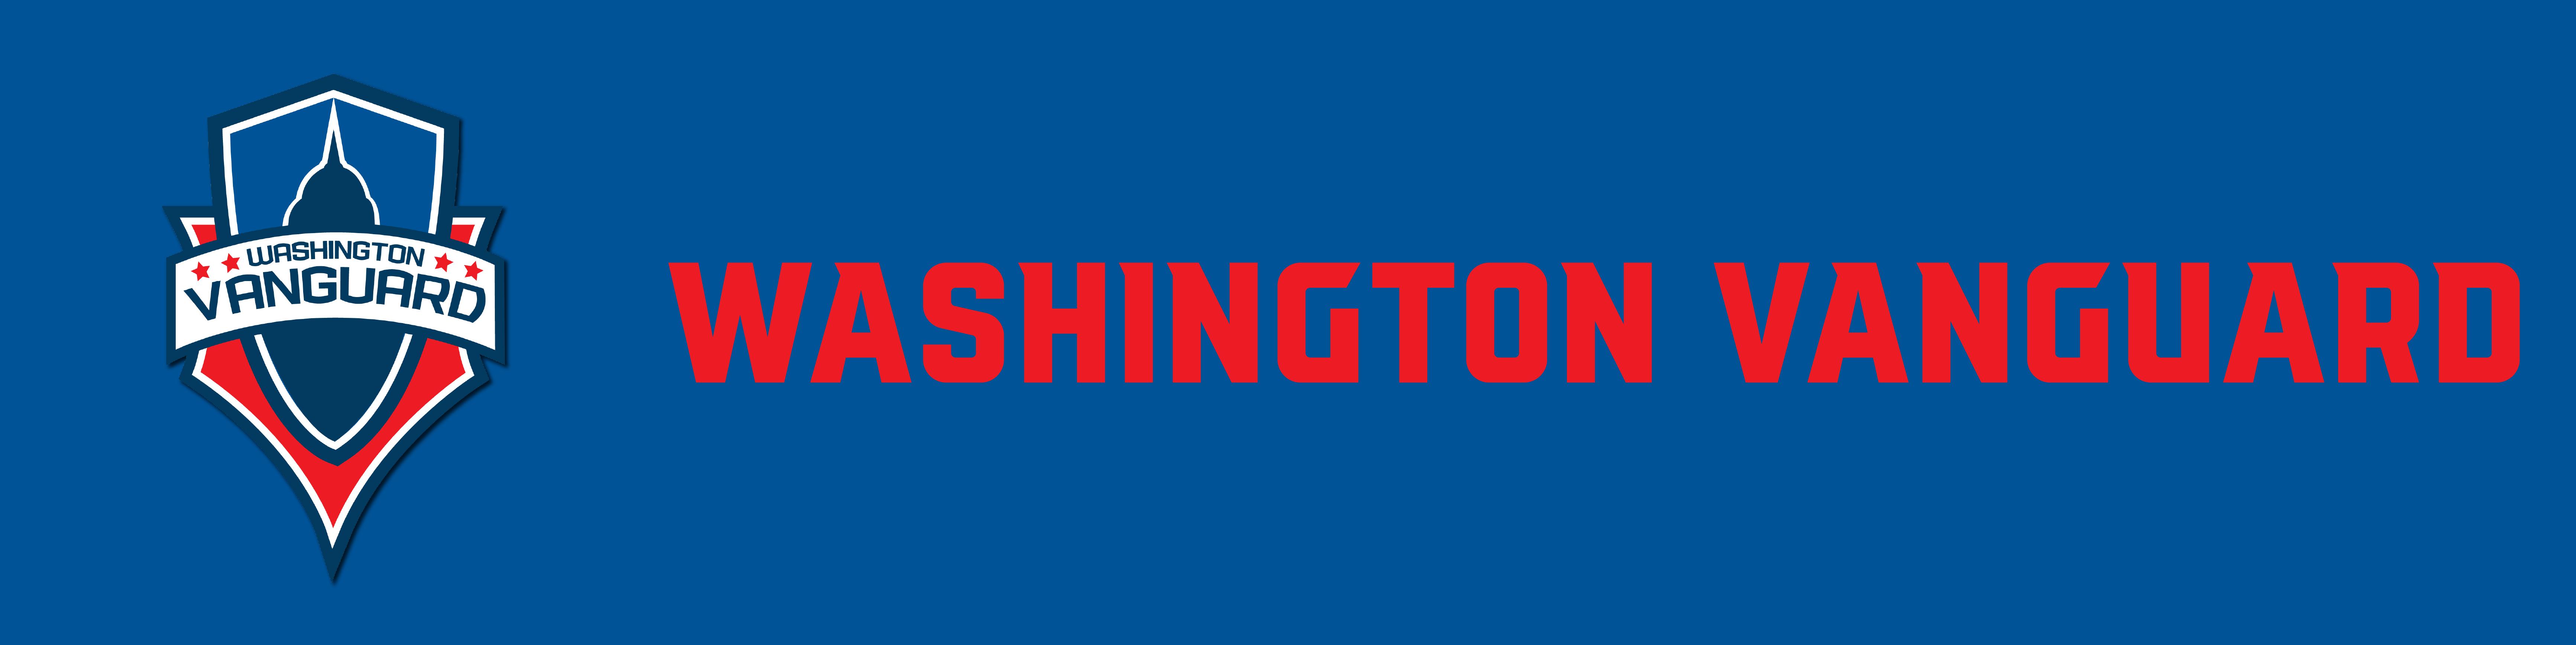 https://i.ibb.co/2578rqJ/Washington-Vanguard1.png